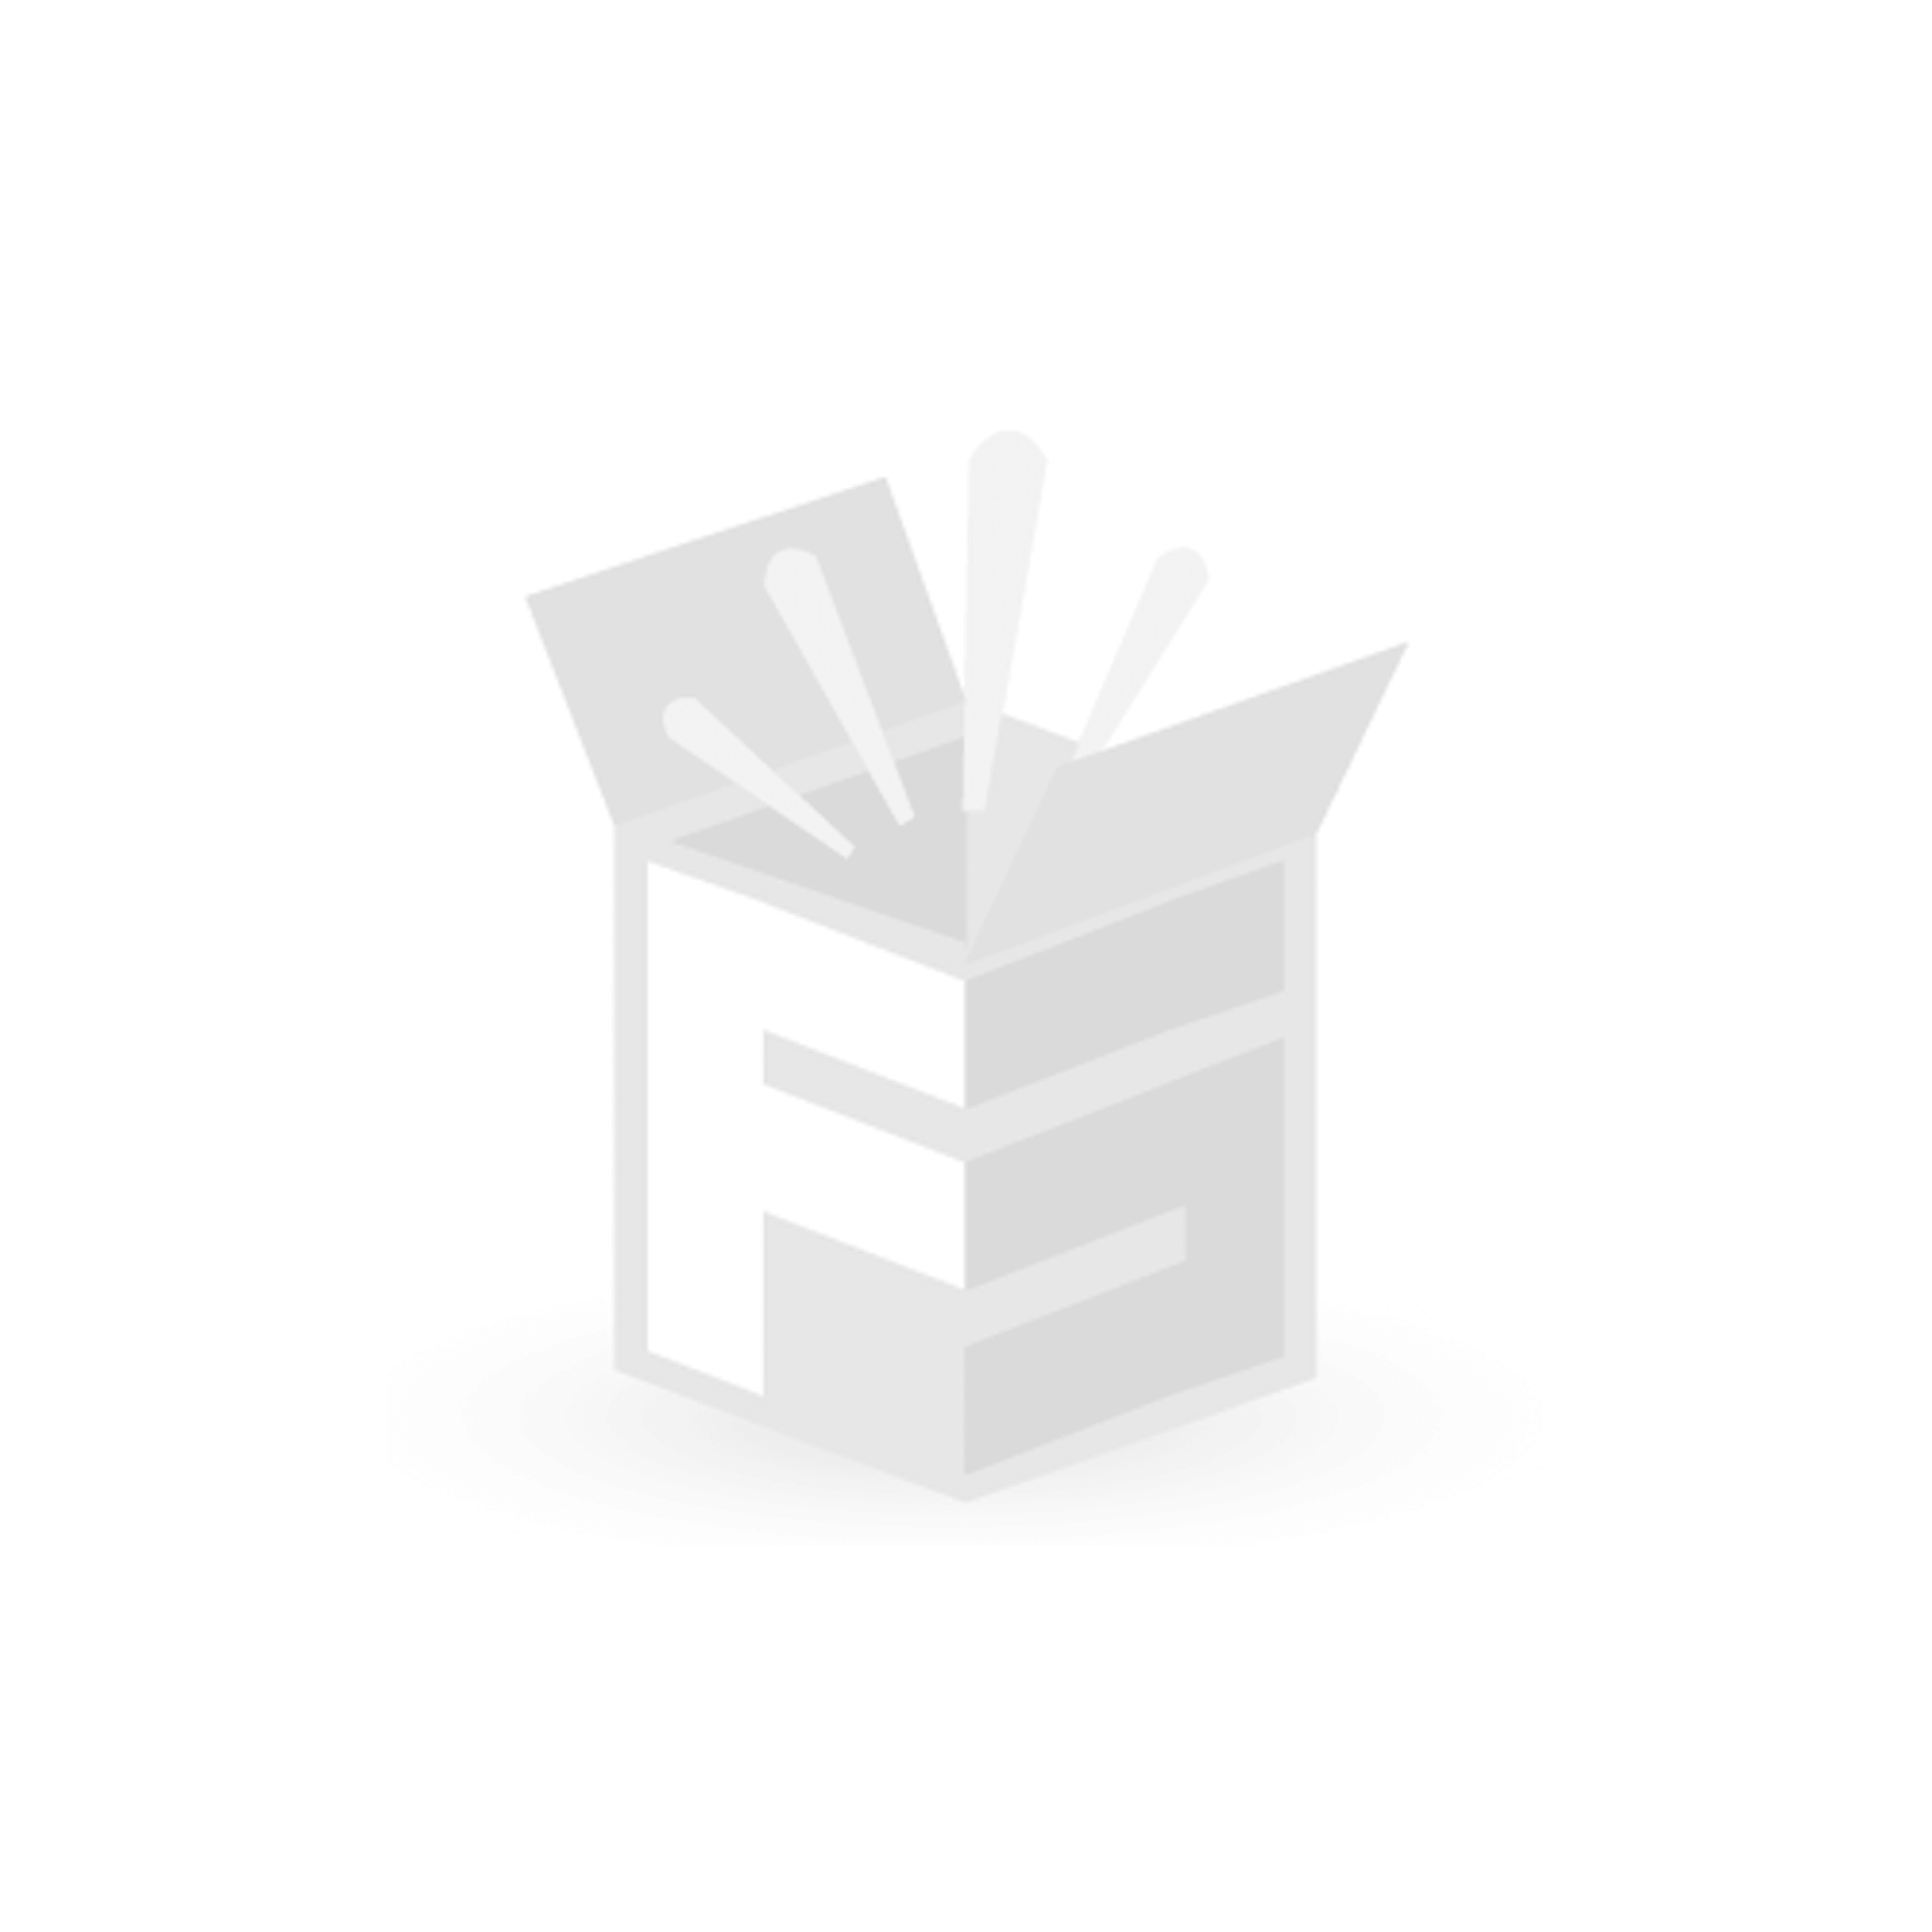 CONTINI Cloison de bureau incl. support DV202, 1180x 581x 18mm